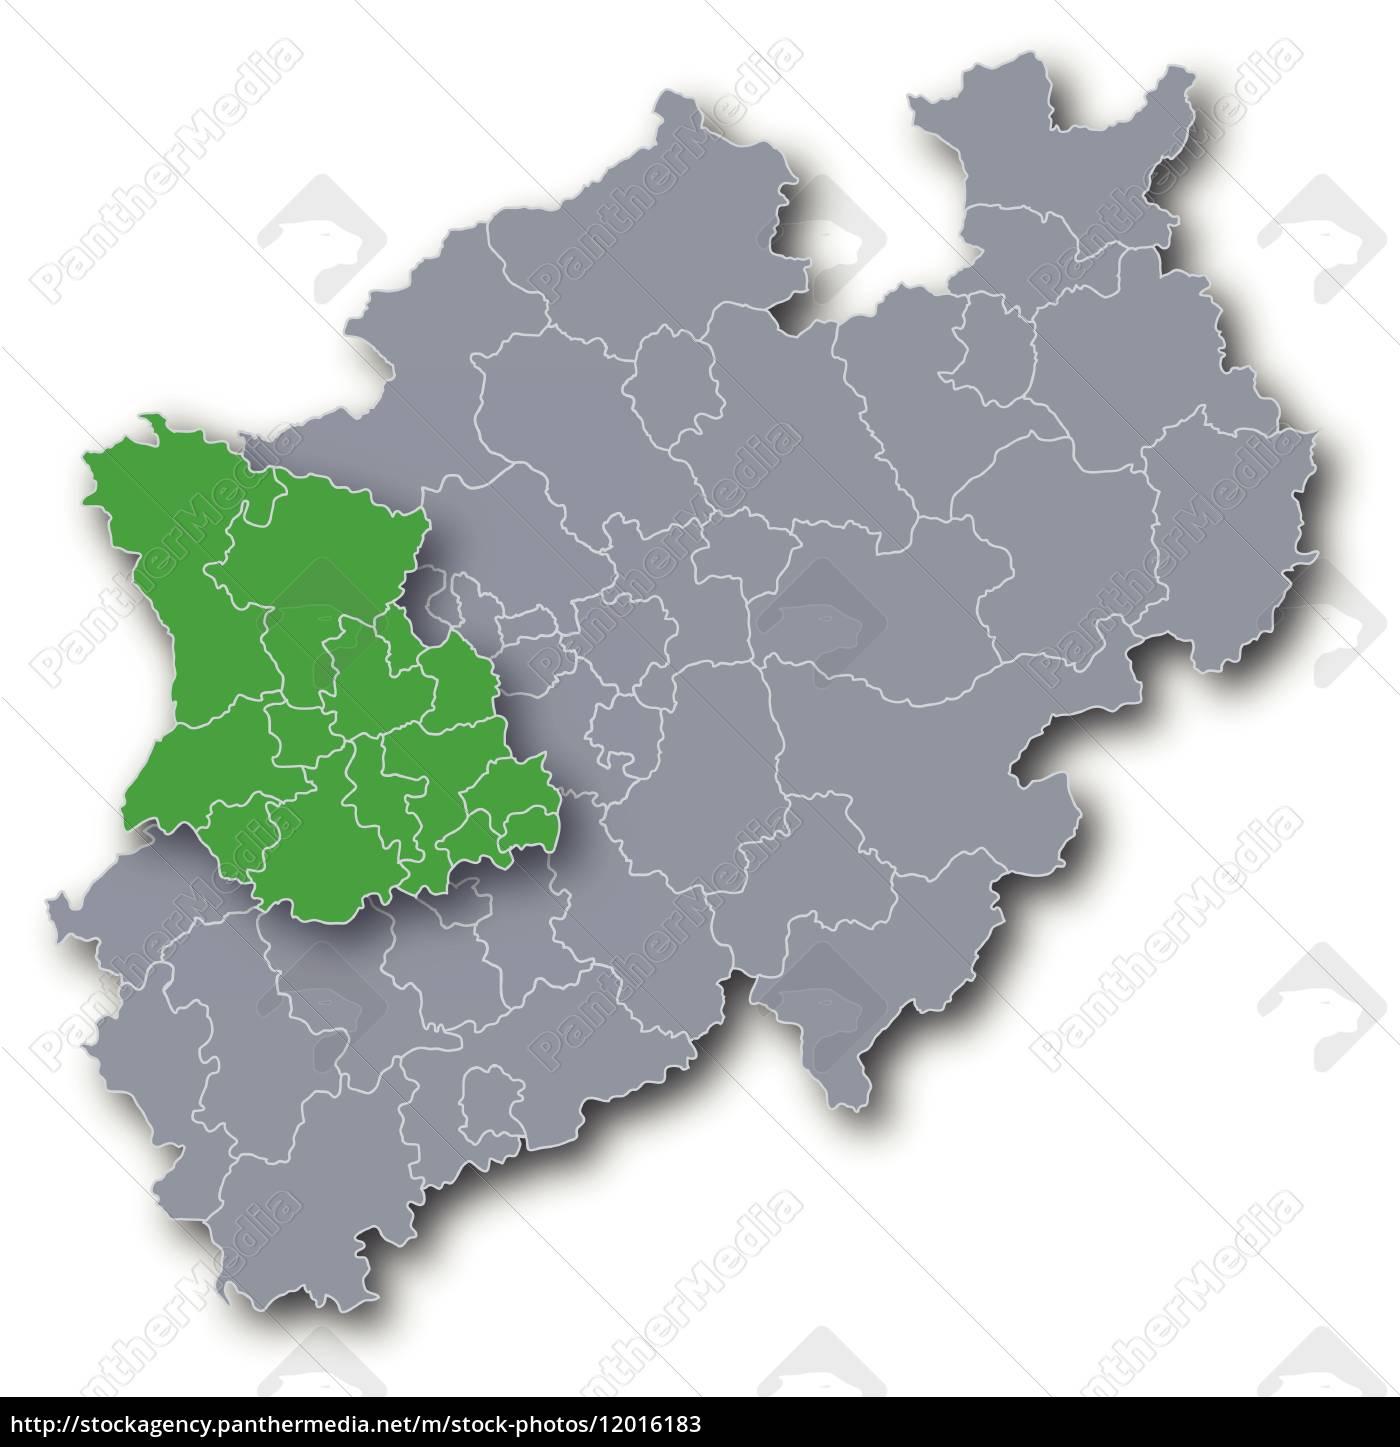 Düsseldorf Karte.Lizenzfreie Vektorgrafik 12016183 Karte Regierungsbezirk Düsseldorf